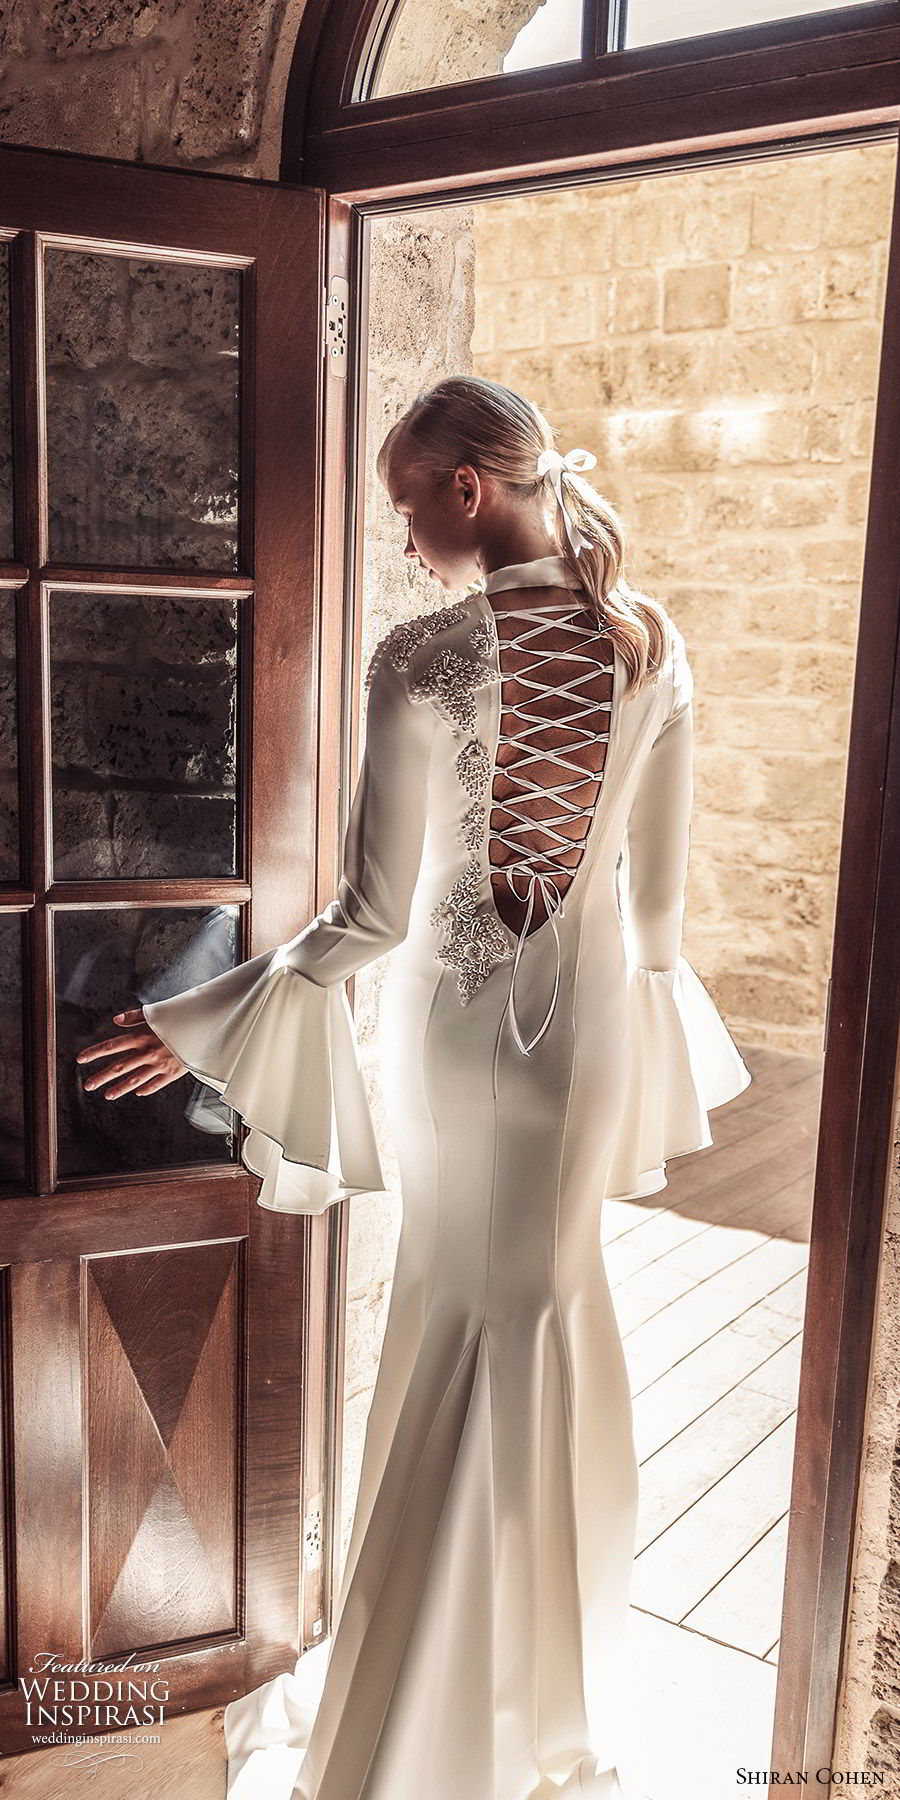 shiran cohen 2019 bridal bell long sleeves high neckline fit flare mermaid wedding dress lace up back chapel train clean elegant modern (9) mv